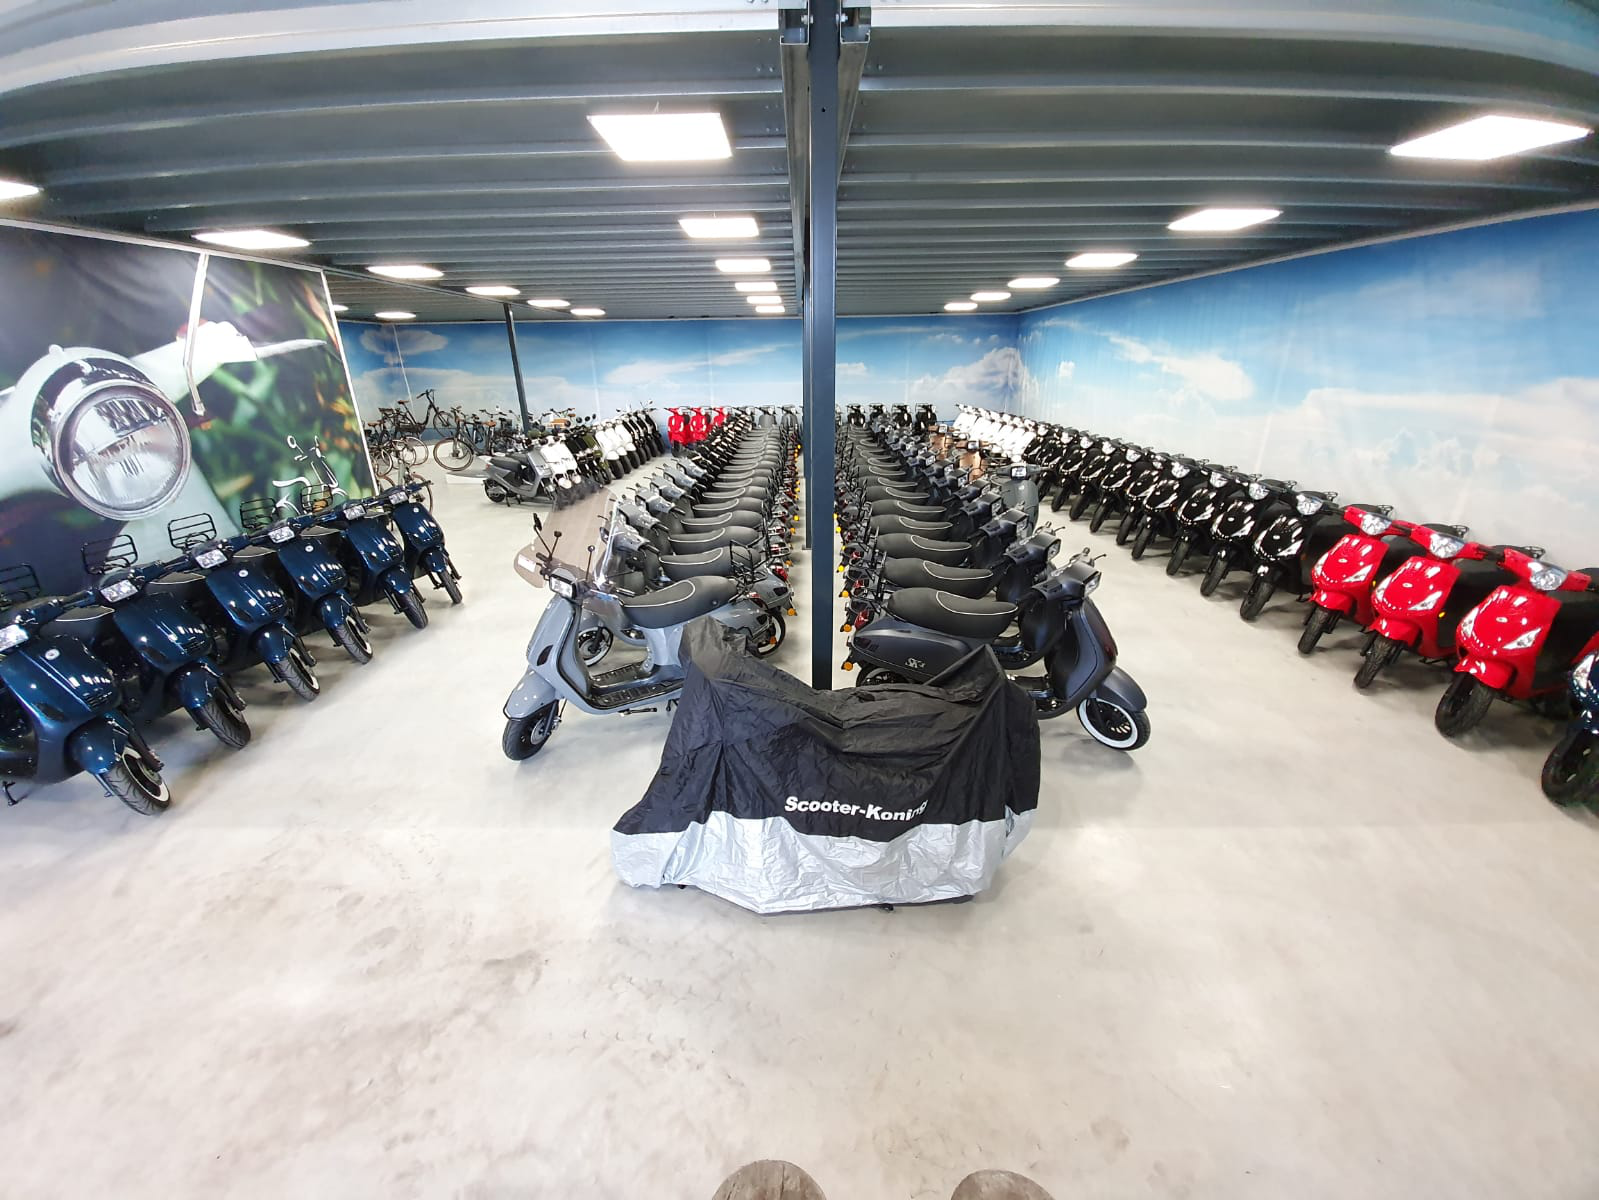 Scooter Koning showroom